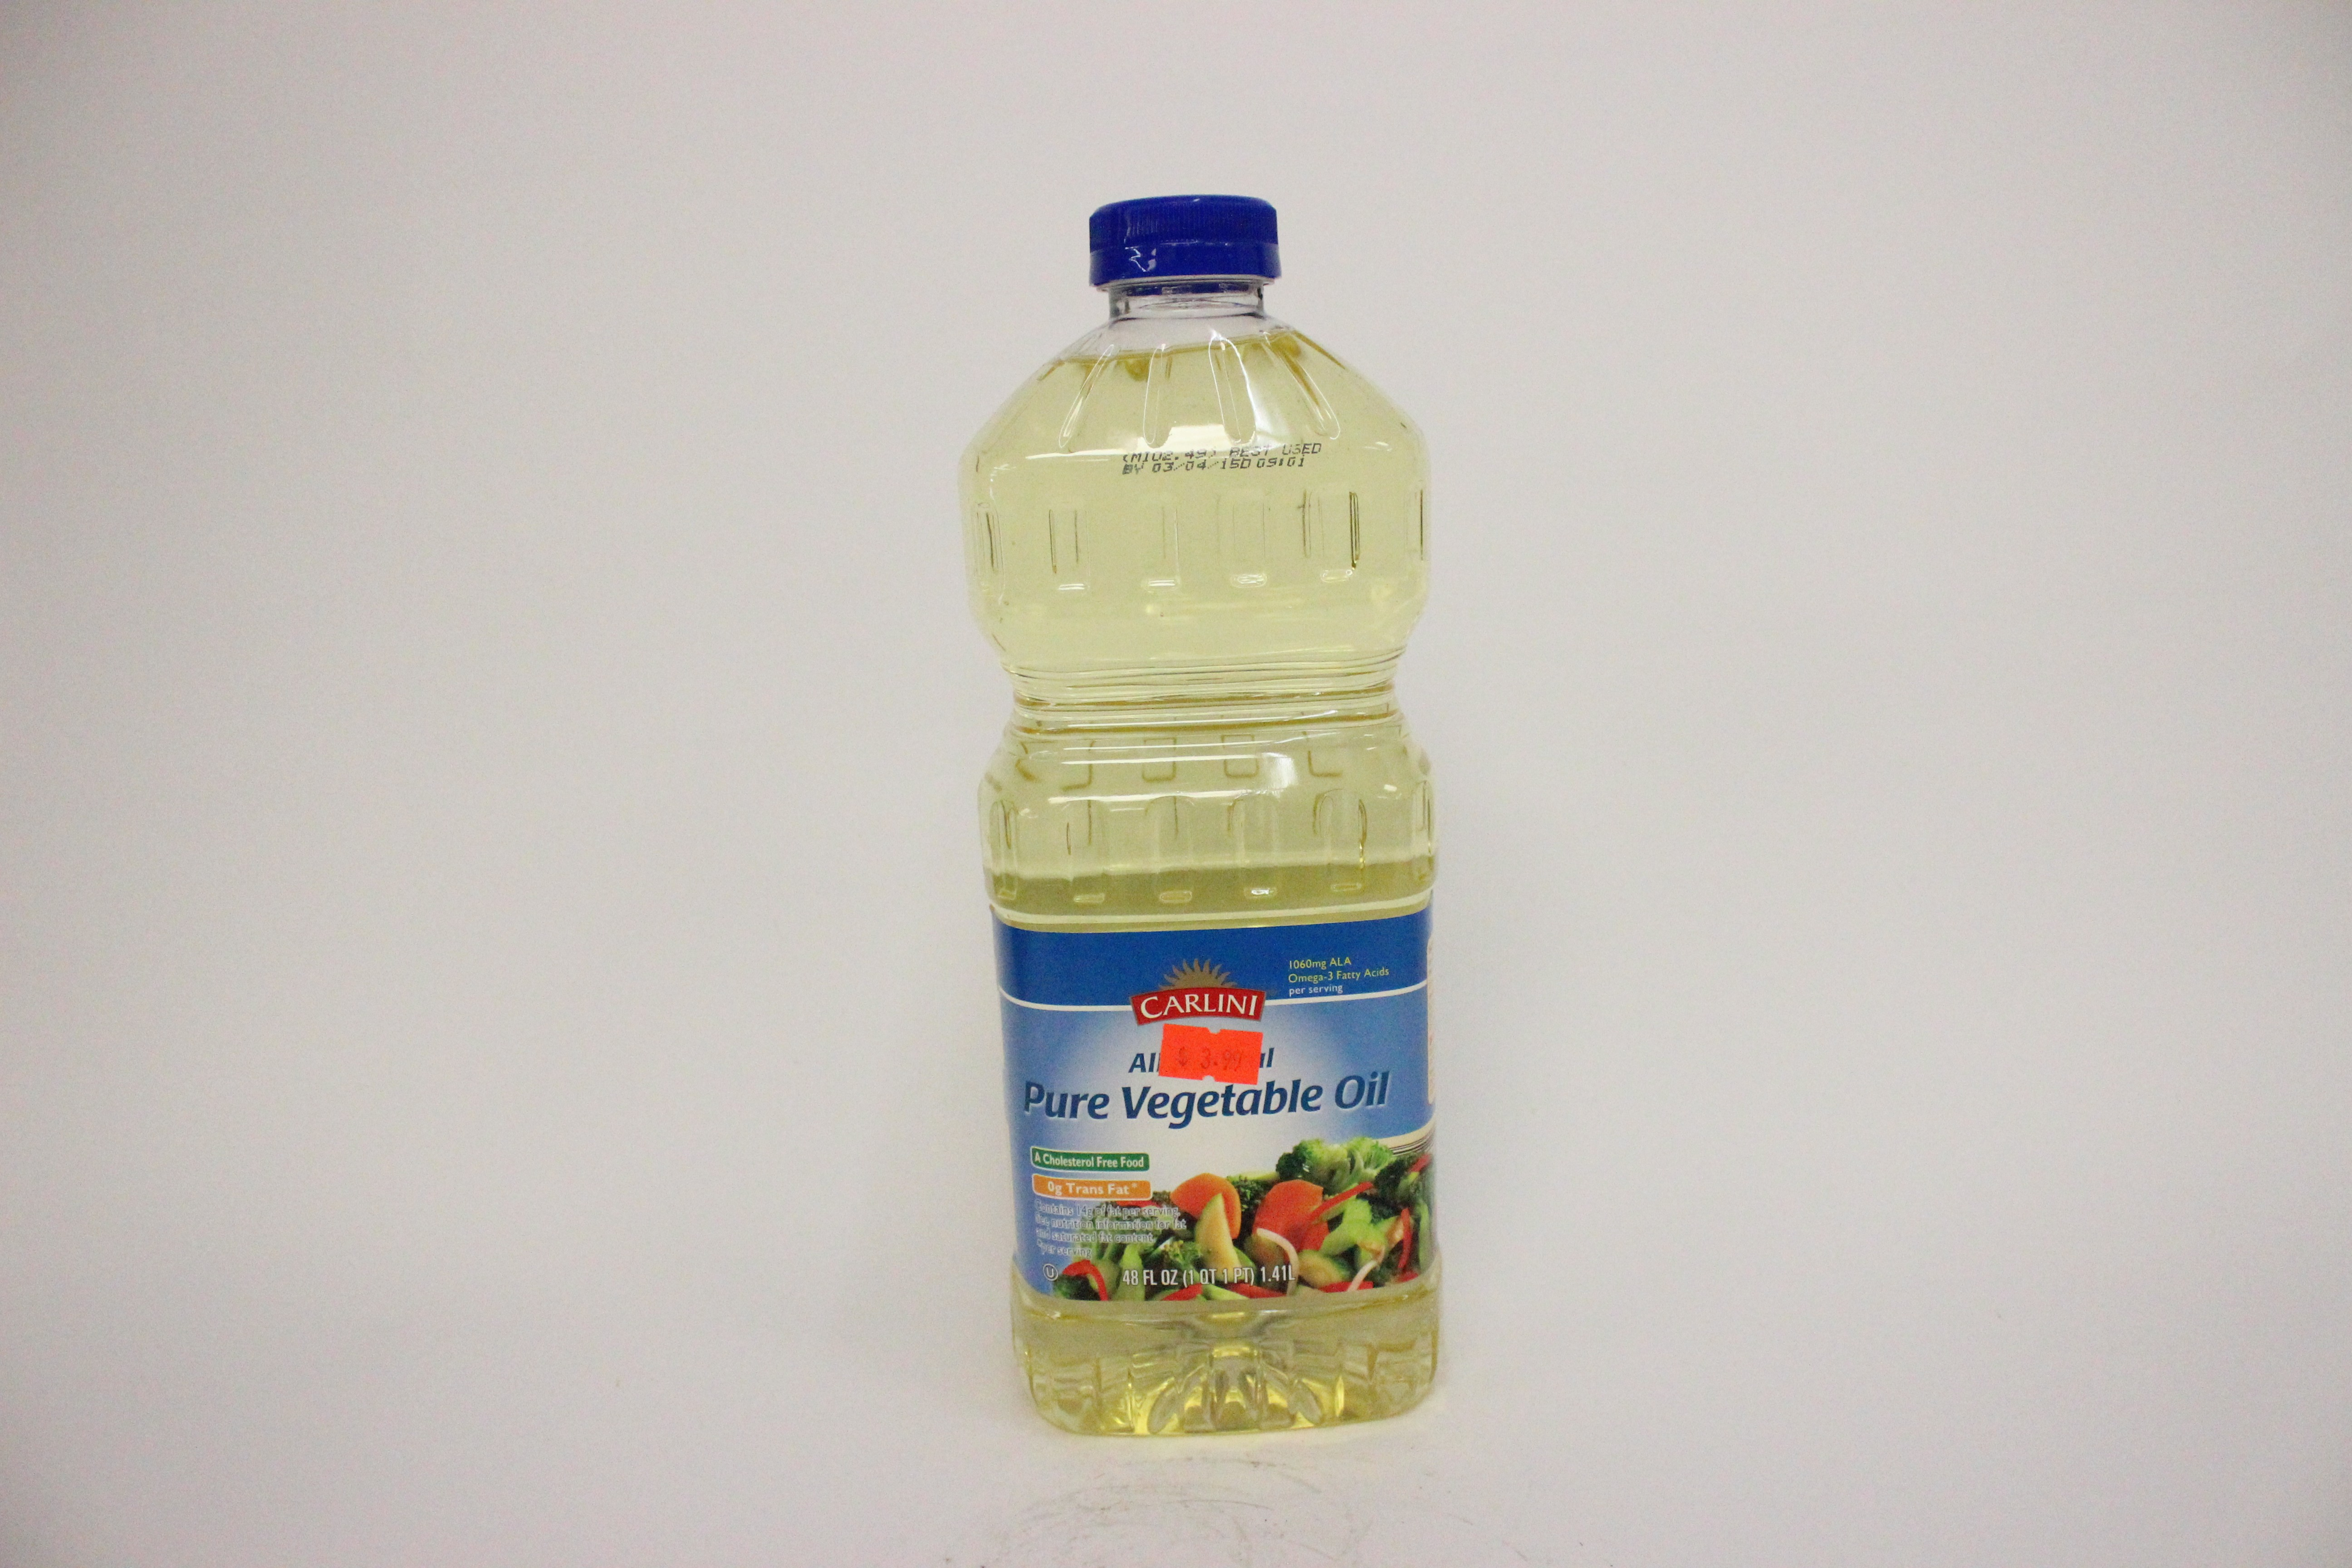 Carlini Pure Vegetable Oil 48 oz